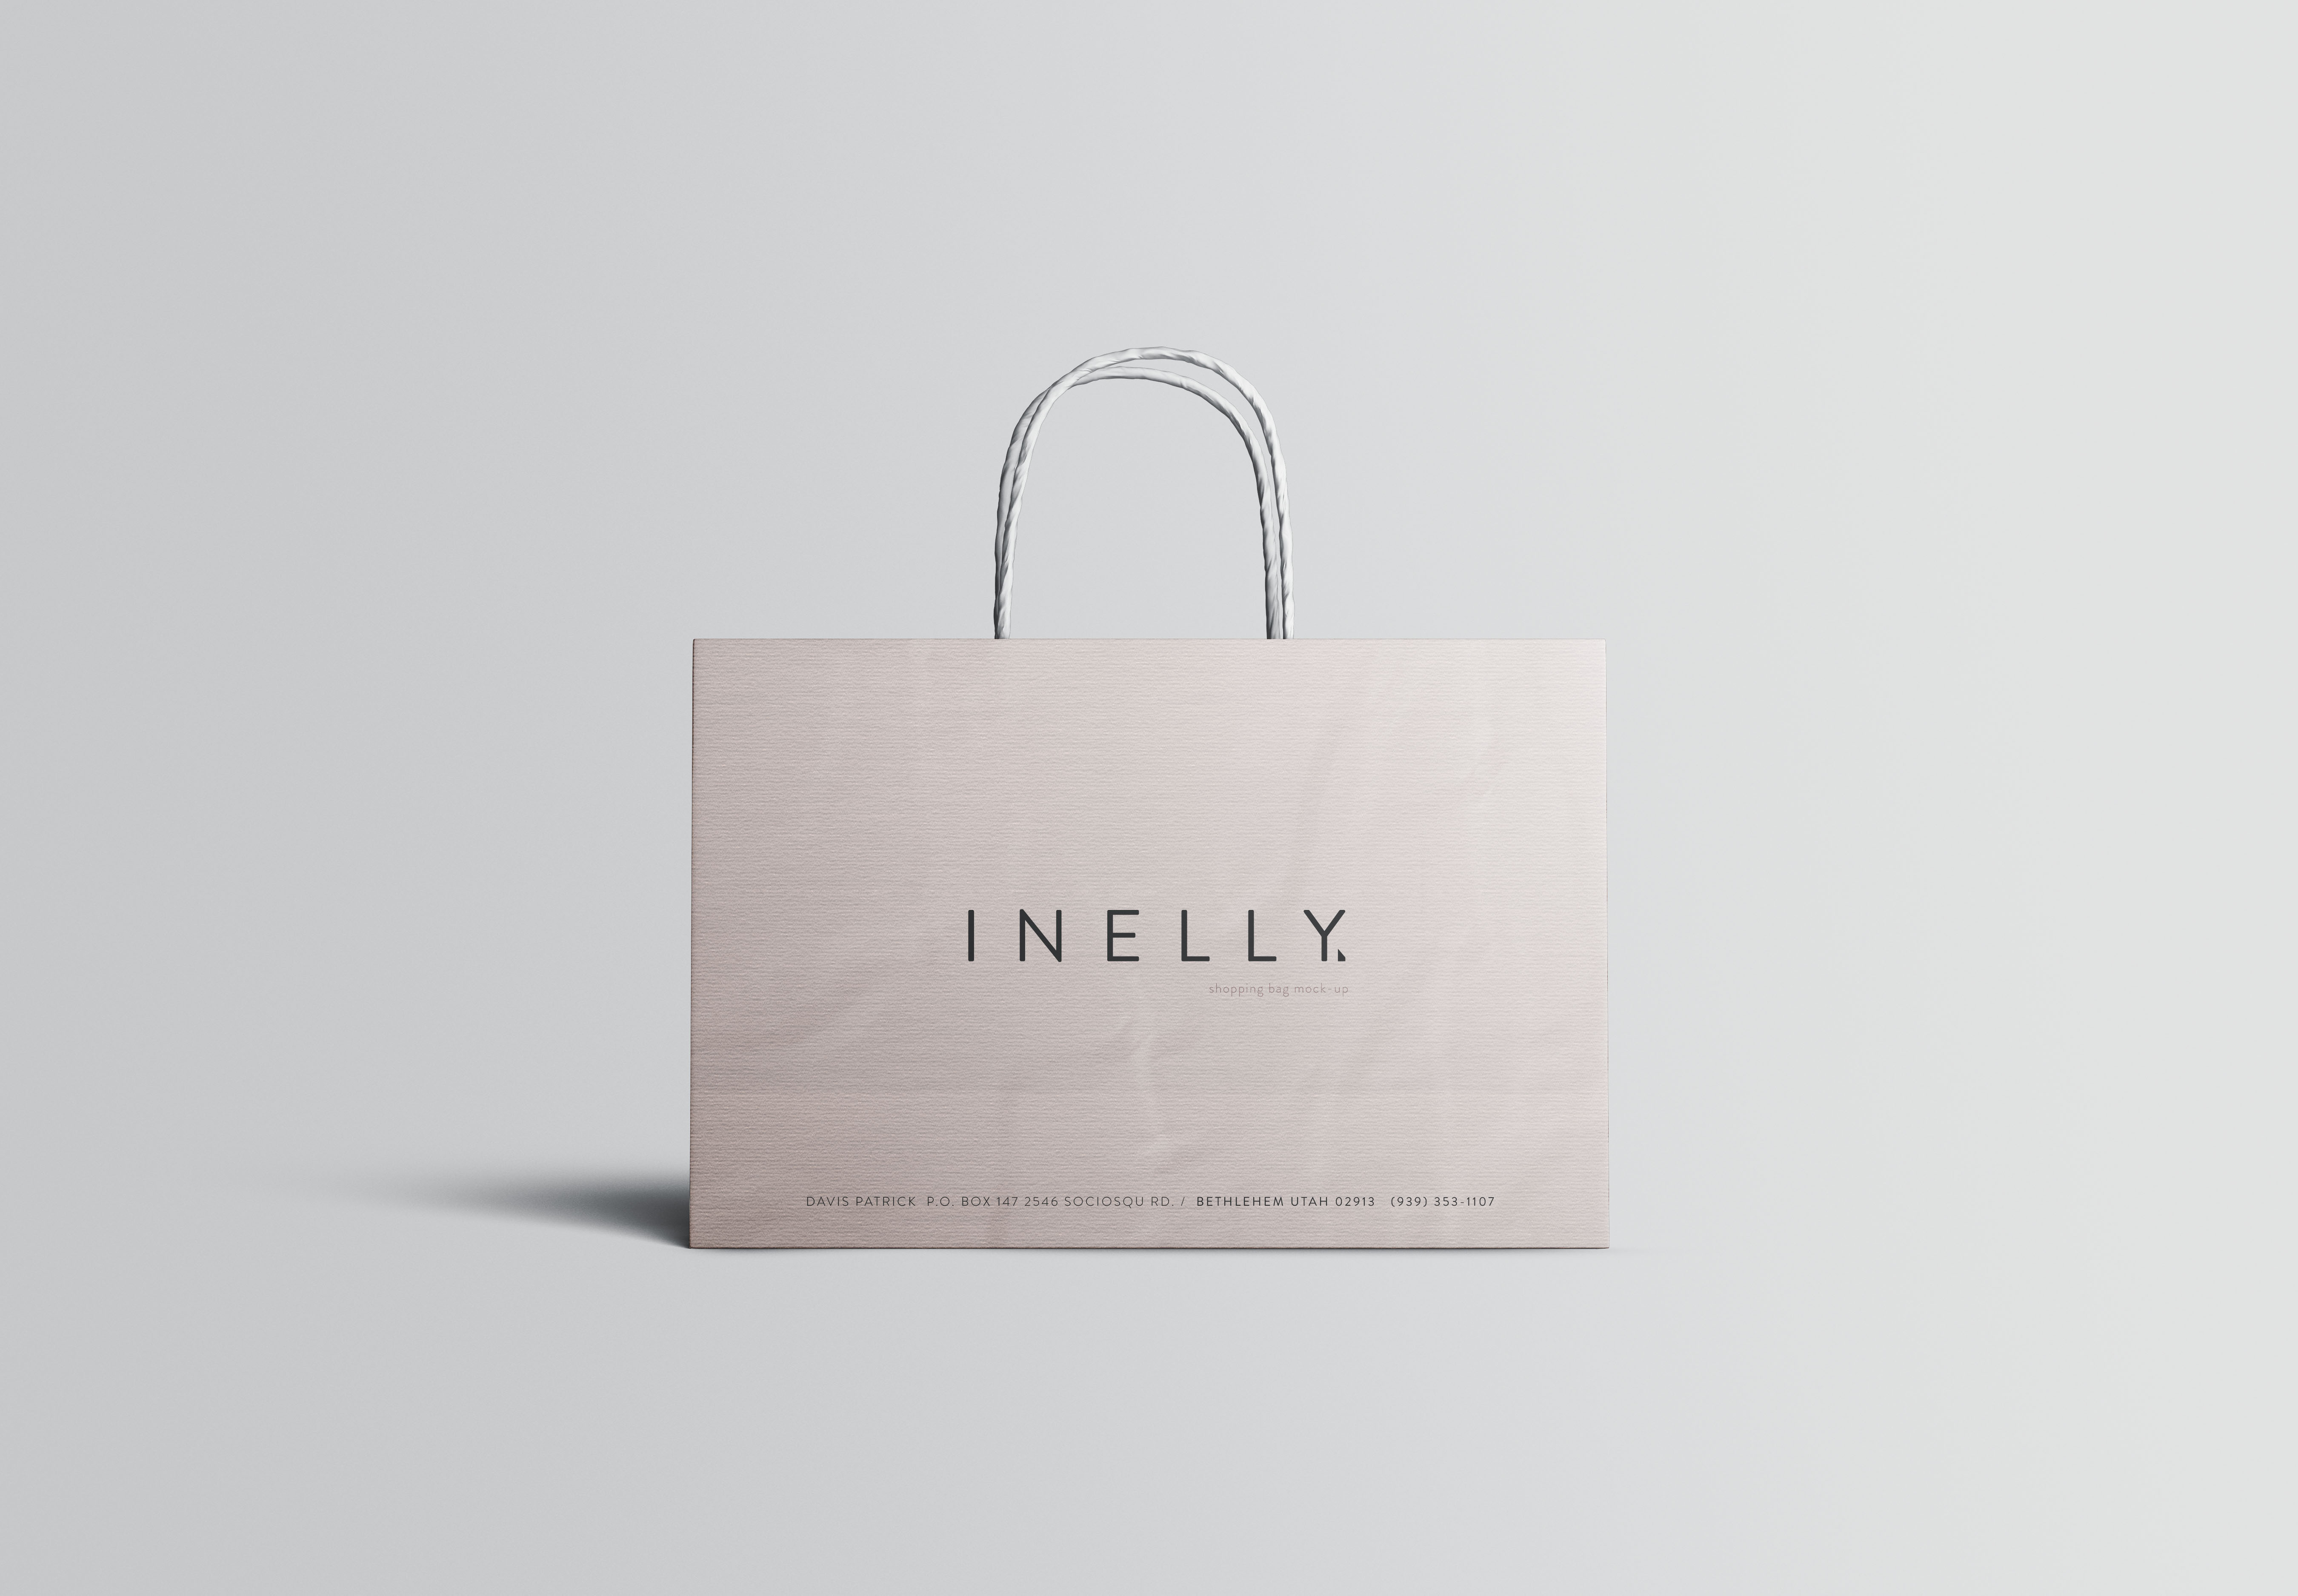 ppt插图素材下载_高端大气纸质商场购物袋手提袋样机 Paper Shopping Bag Mockup – 早道 ...